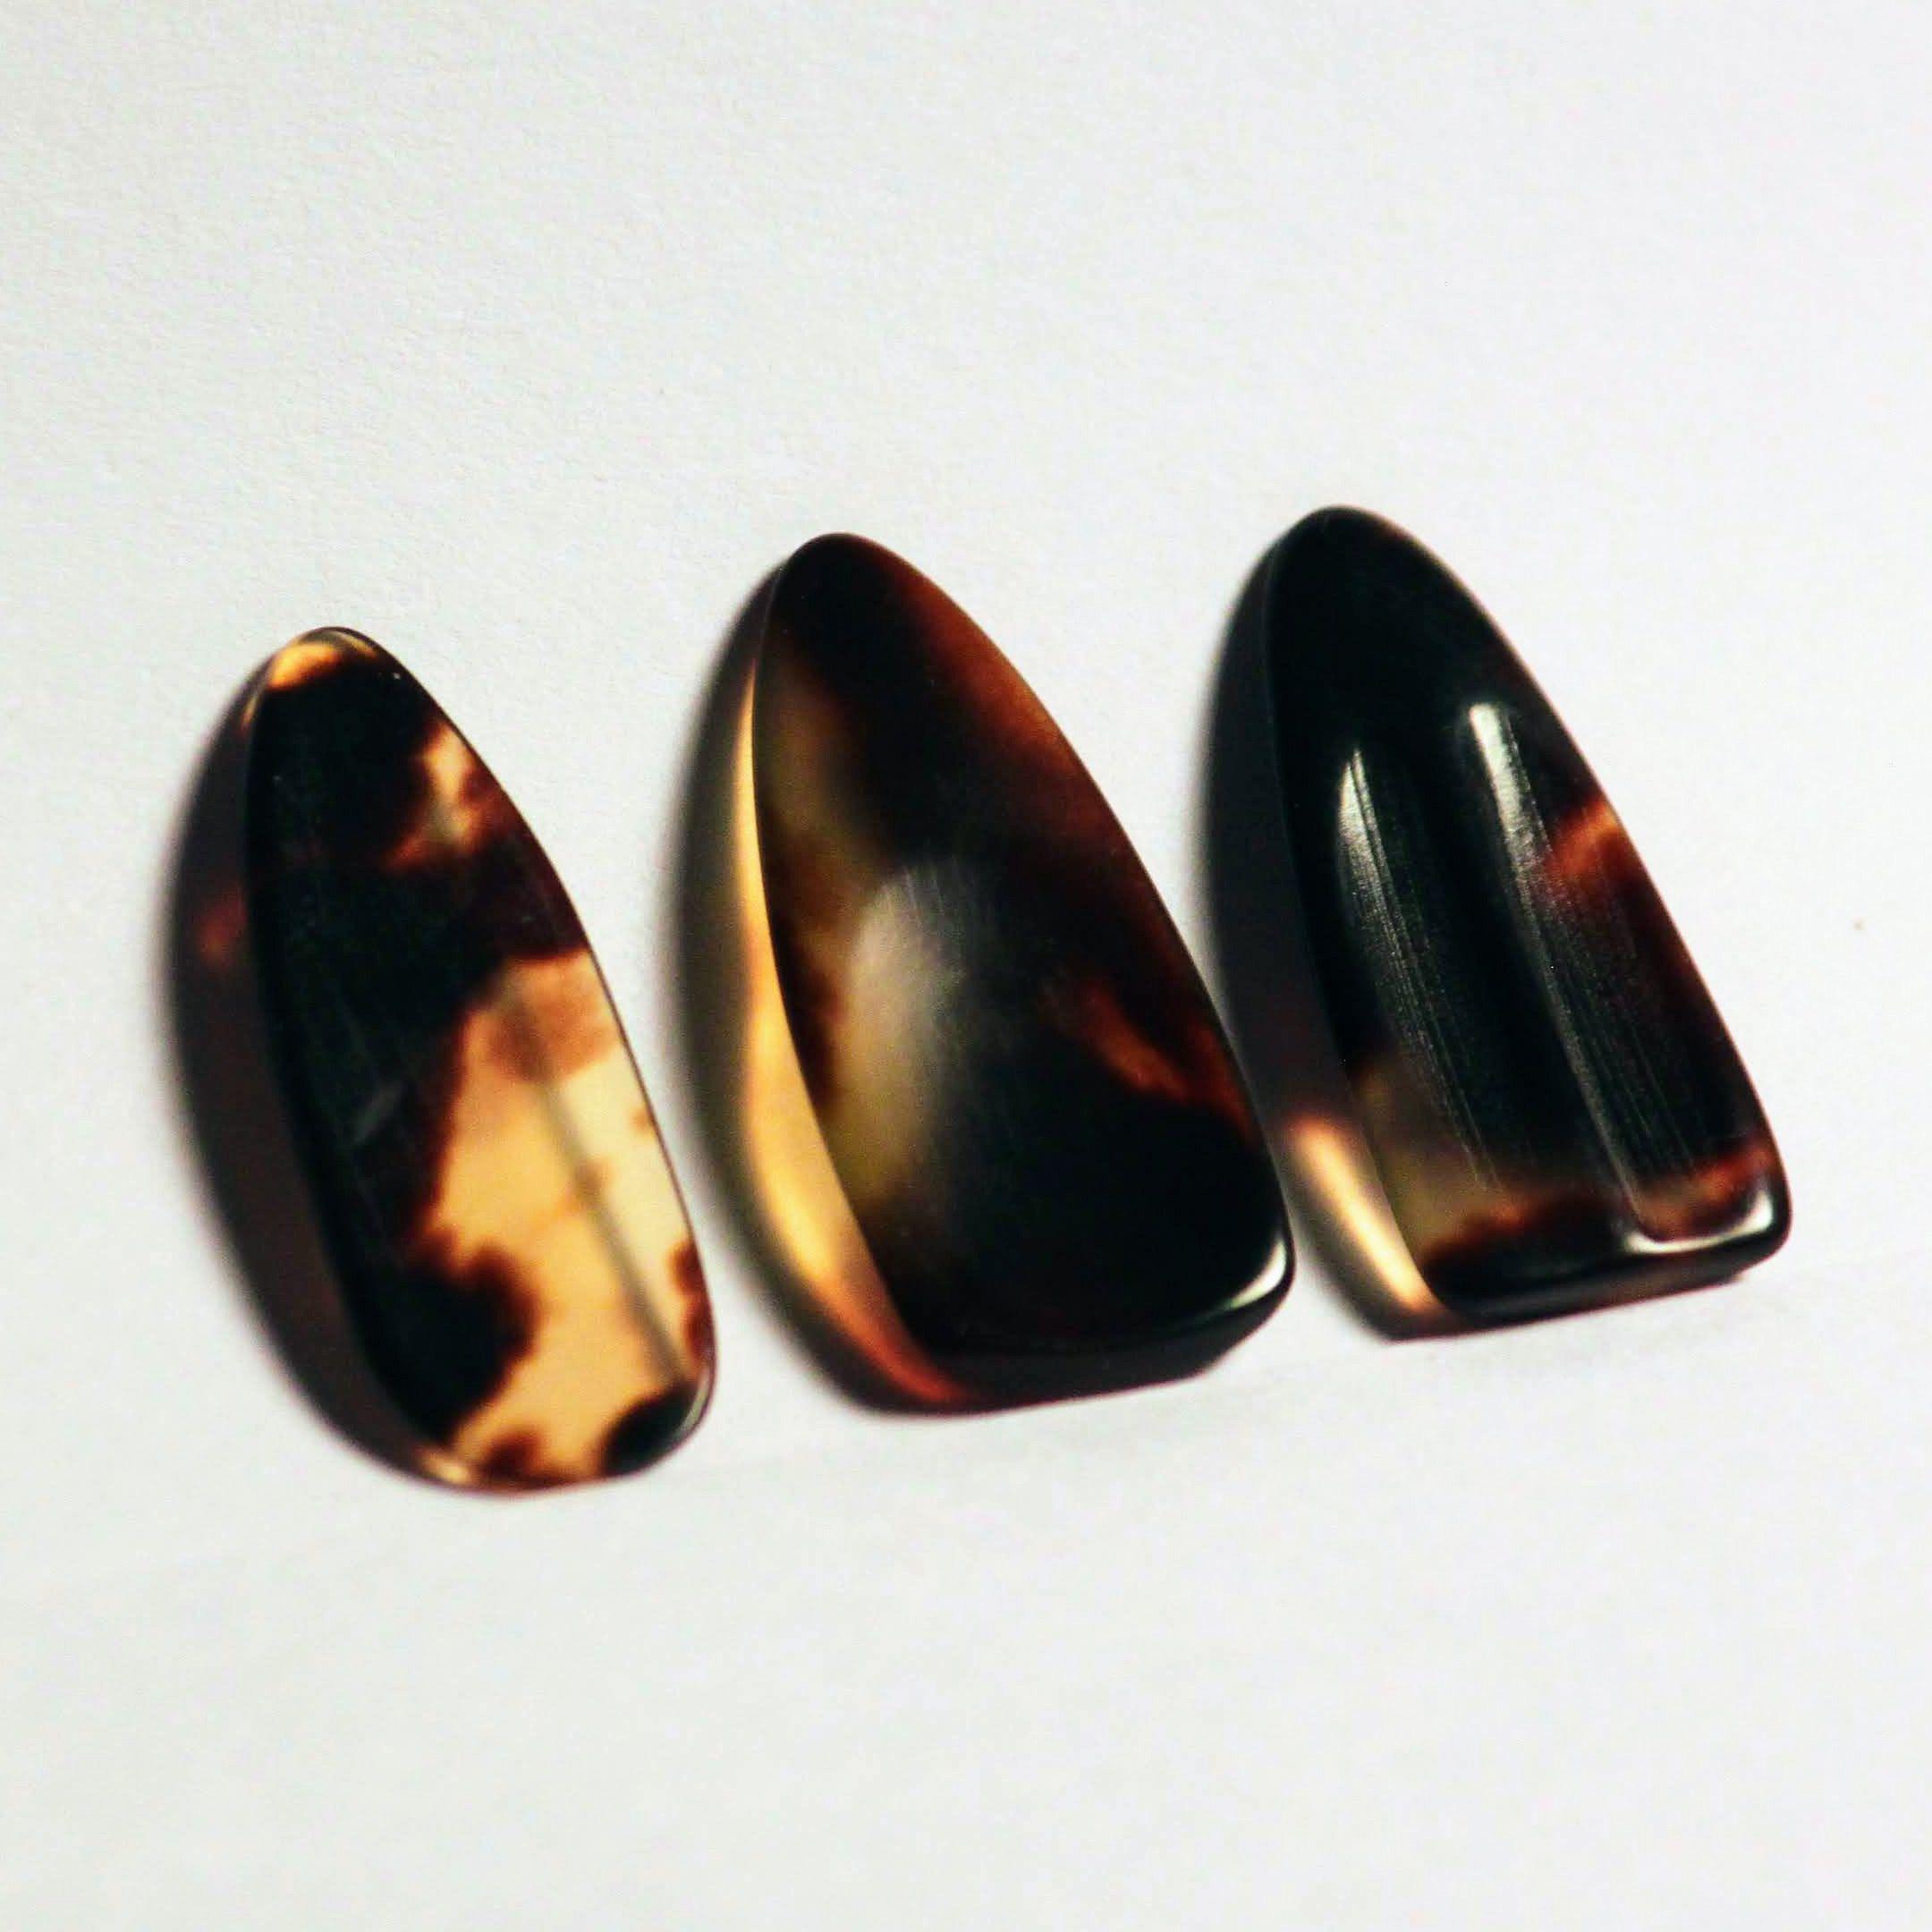 Tortoise Shell nails, variety of styles.